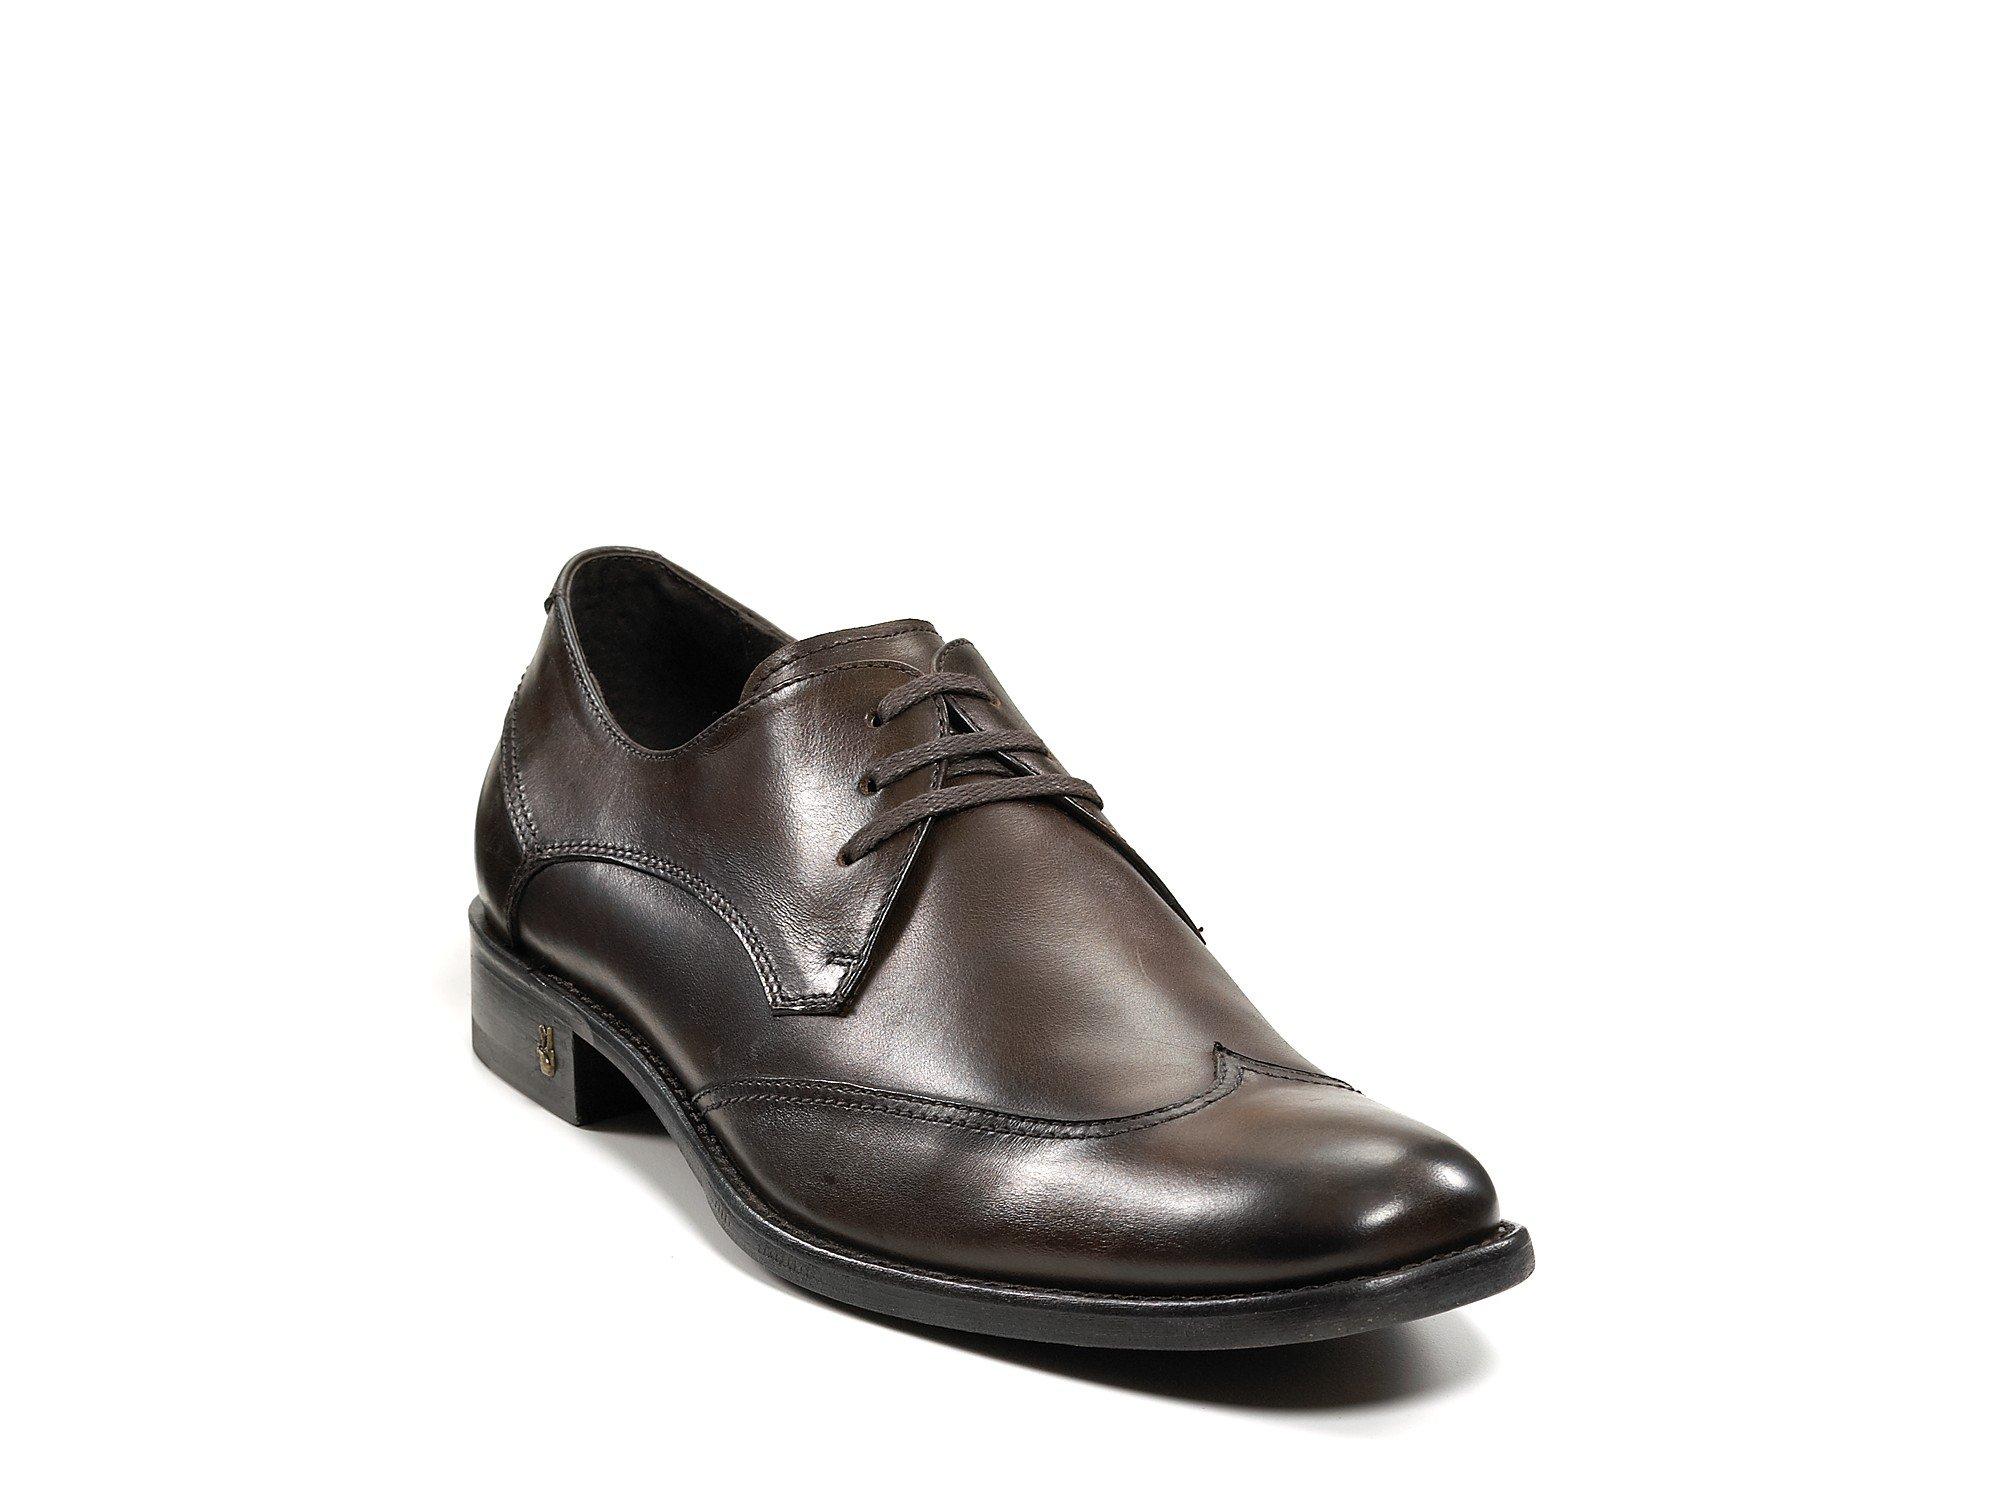 varvatos usa wingtip dress shoe in brown for